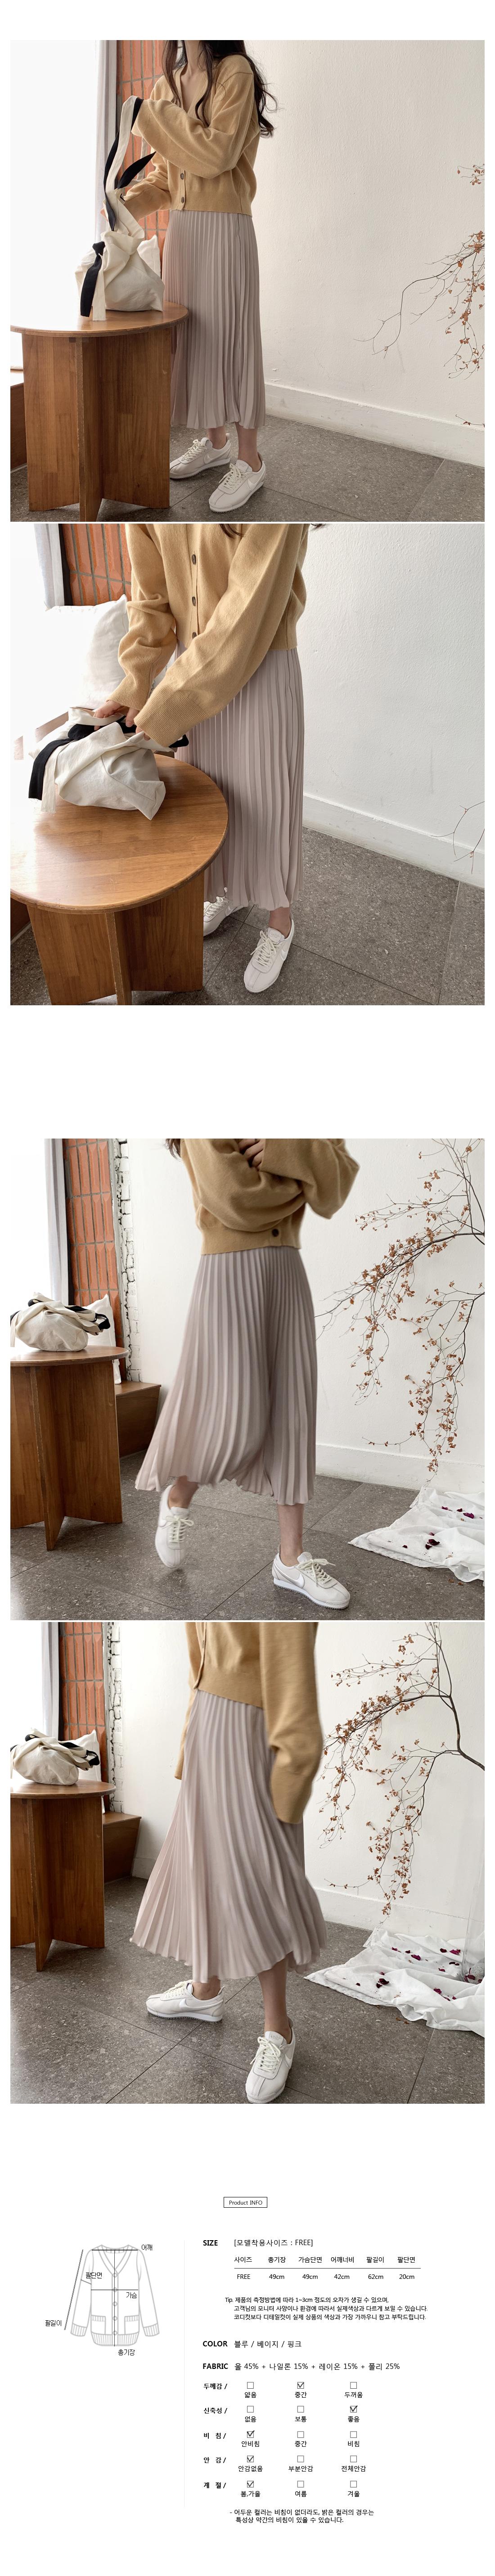 Romance Knit Cardigan-Beige, Pink